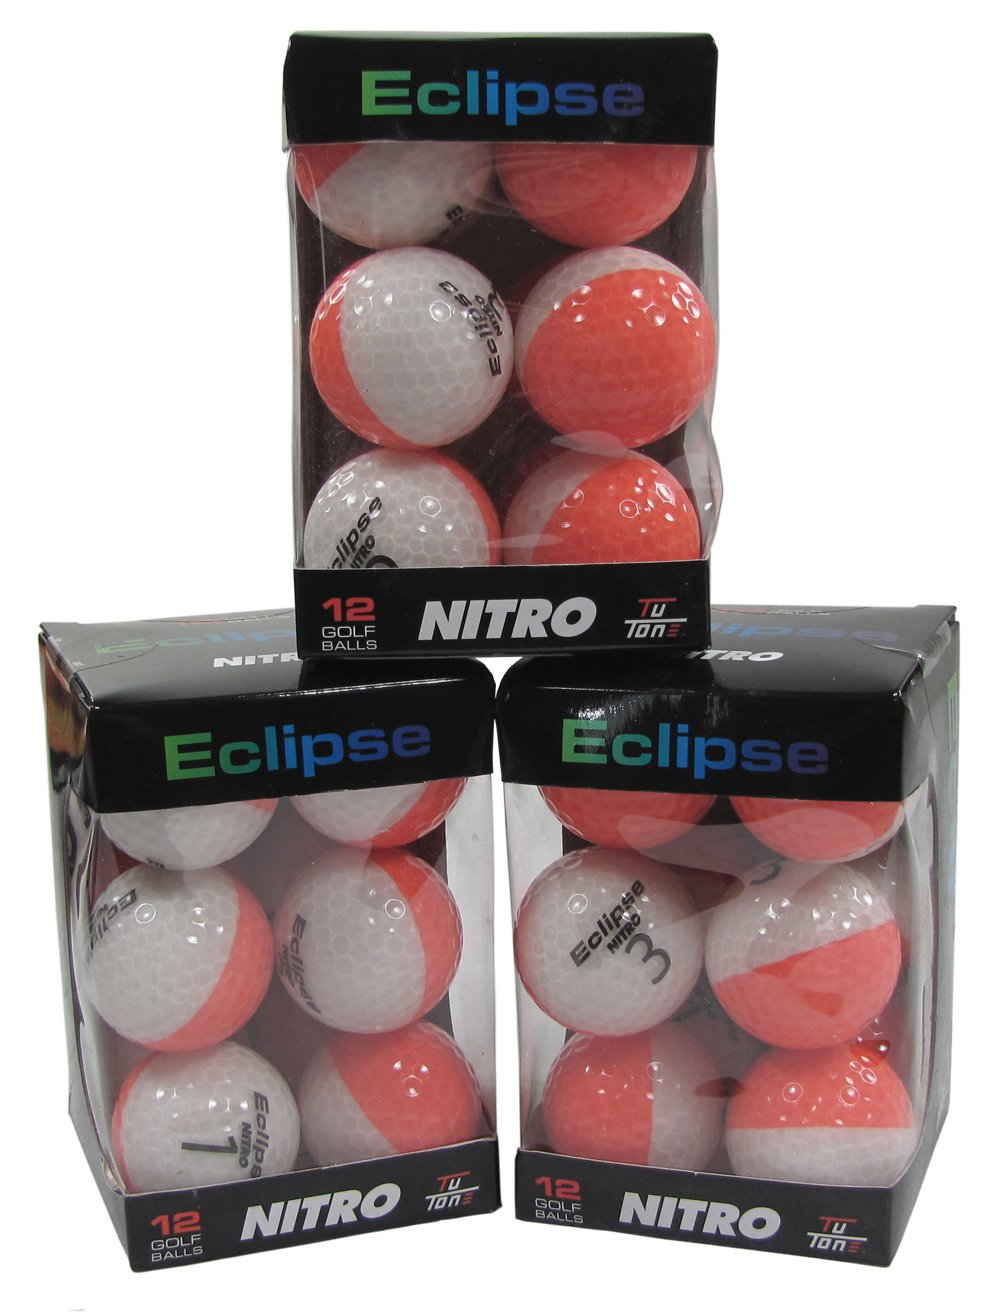 Nitro Golf エクリプス ゴルフボール (12個パック) コーラル/ホワイト   B0050LXZOM